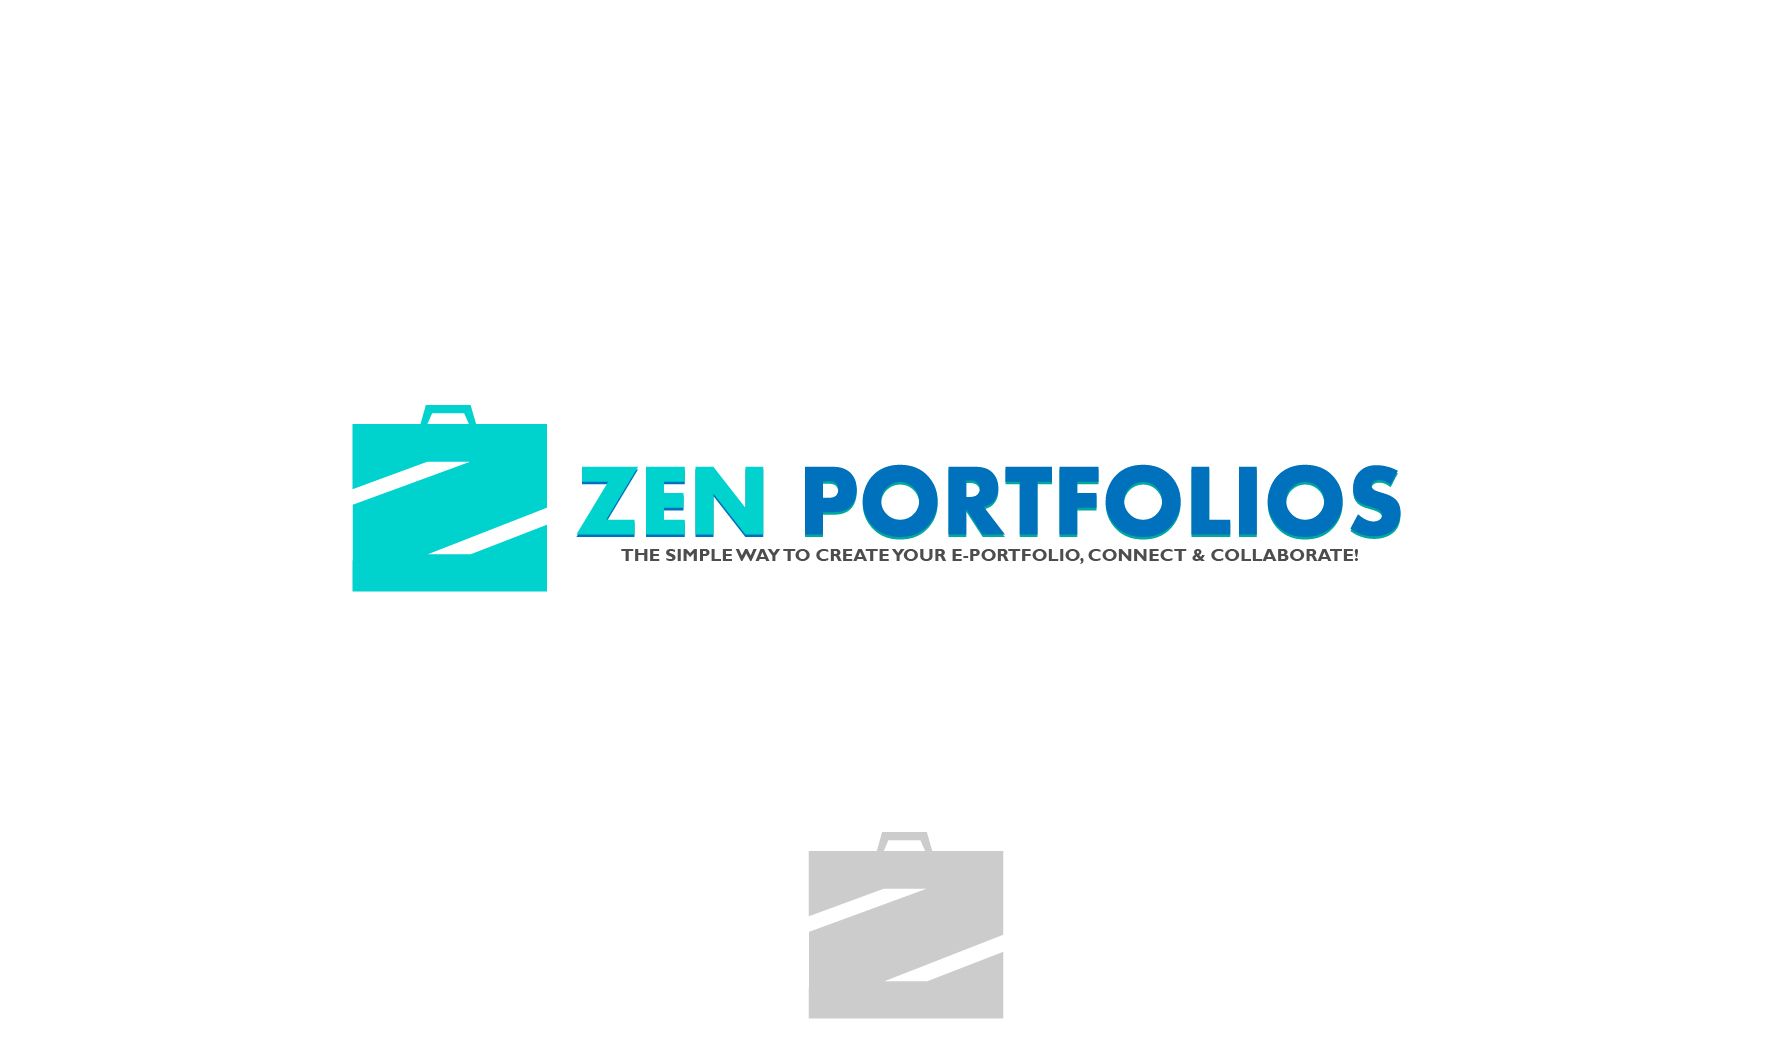 Logo Design by 3draw - Entry No. 68 in the Logo Design Contest New Logo Design for ZEN Portfolios.